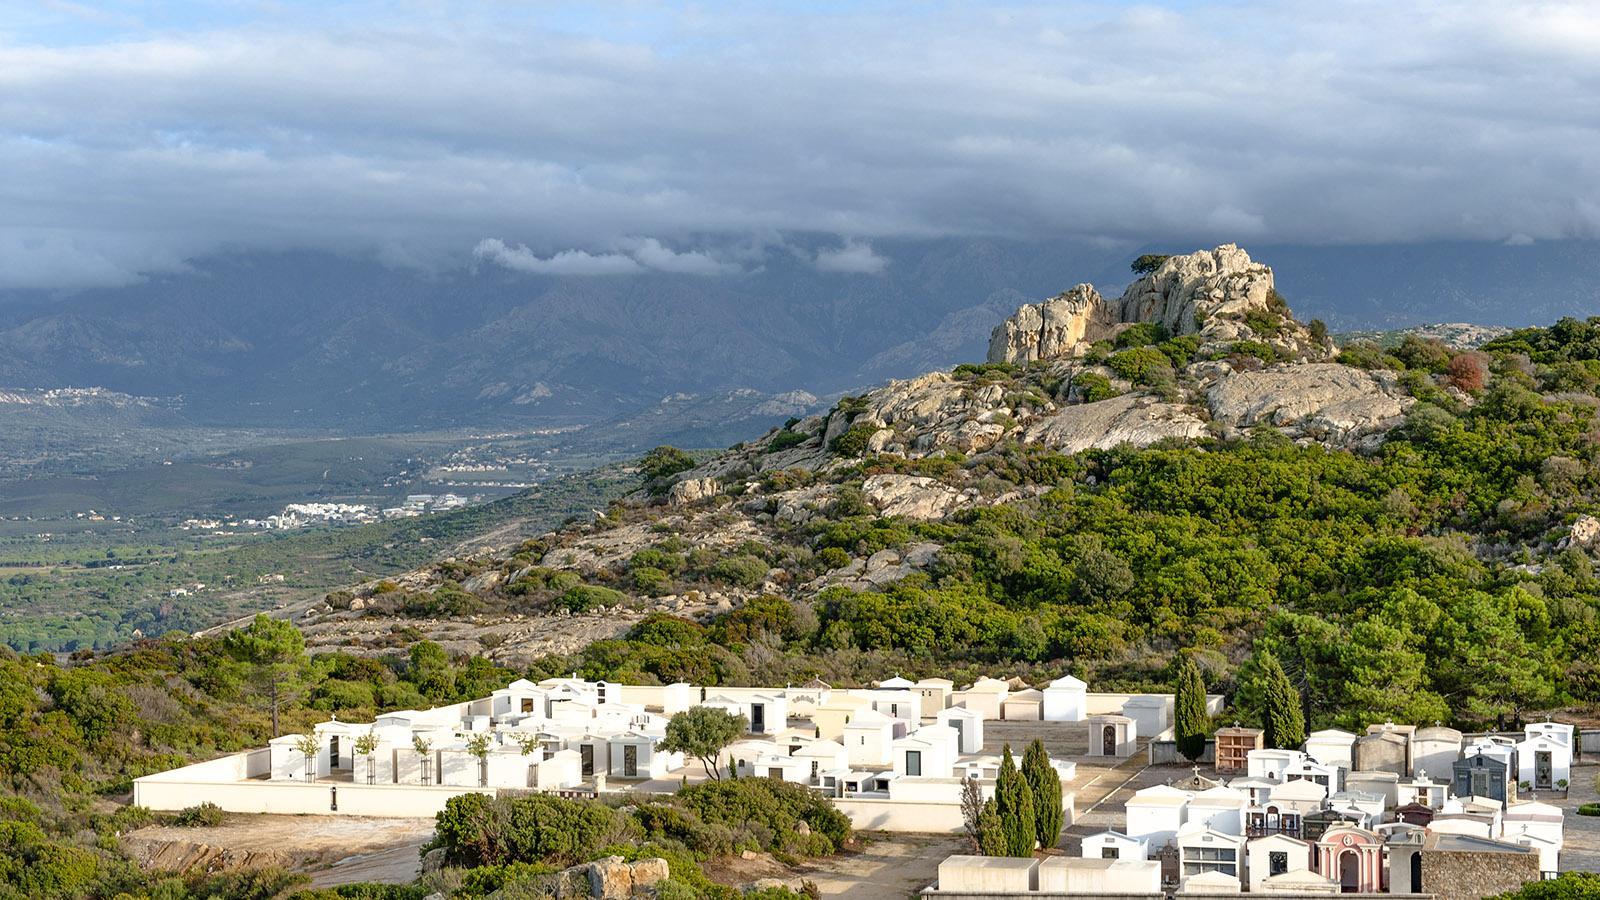 alvi: Blick von Notre-Dame de la Serra auf den Friedhof. Foto: Hilke Maunder